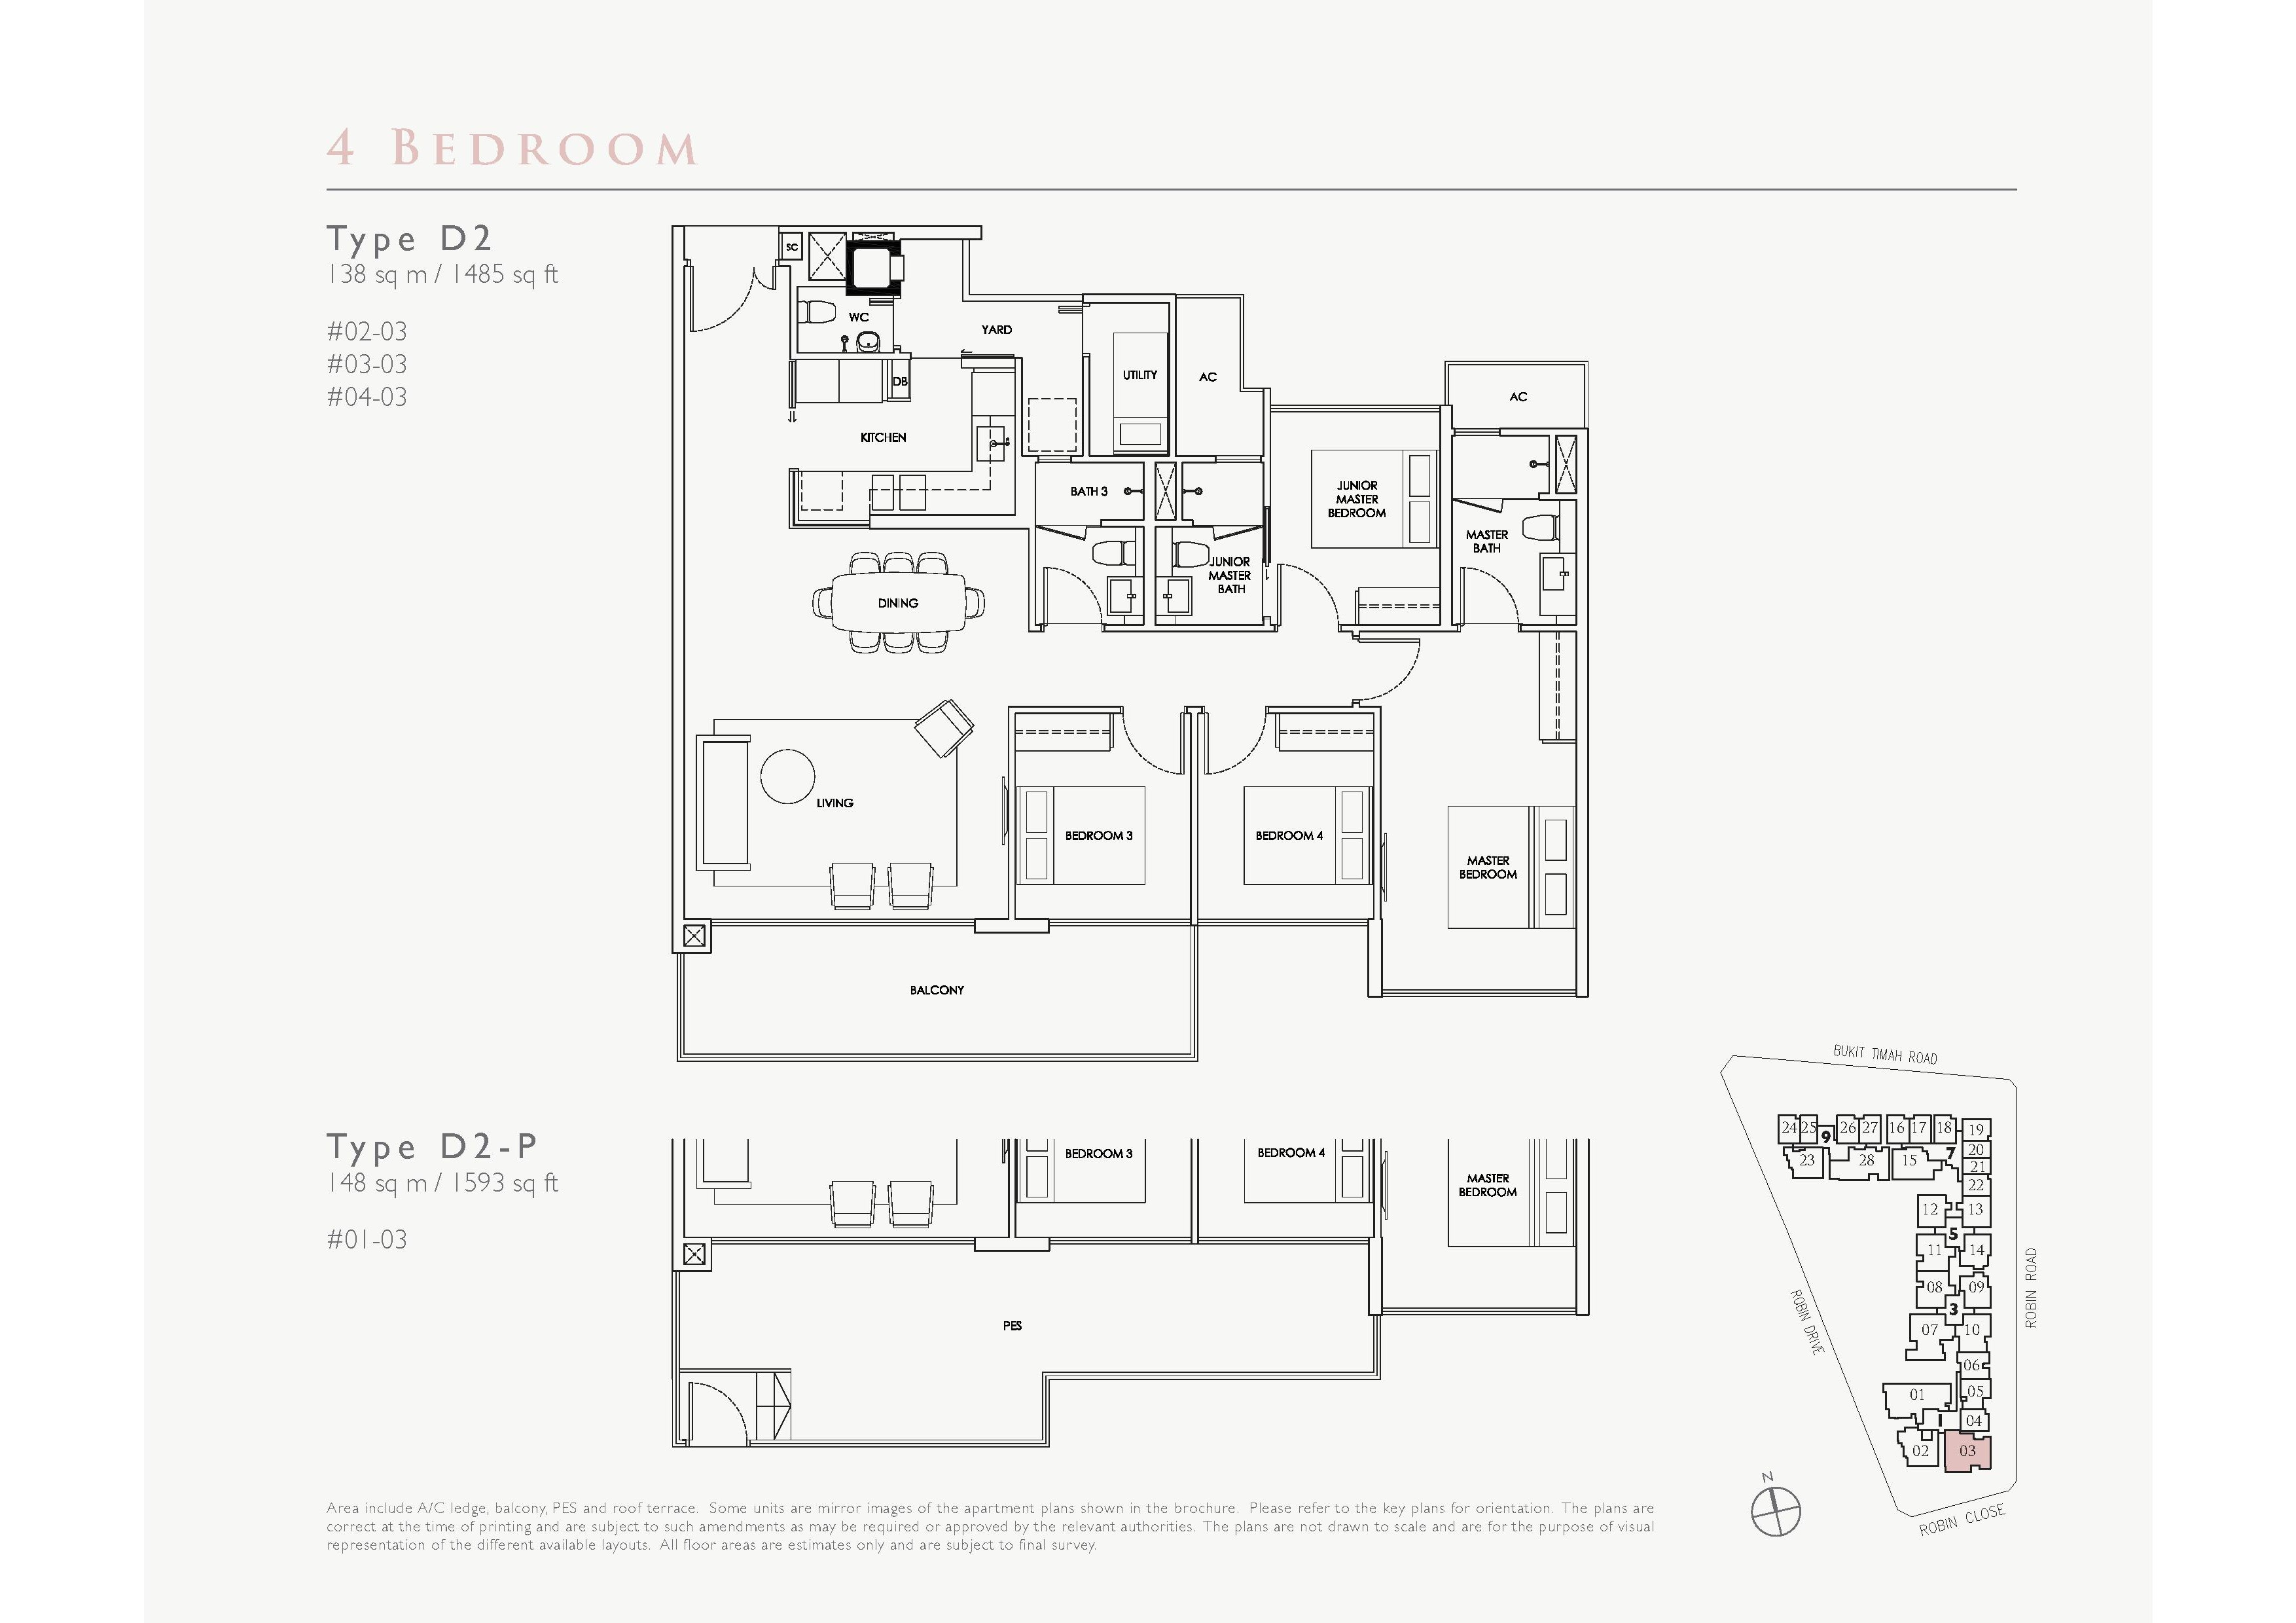 Robin Residences 4 Bedroom Floor Plans Type D2, D2-P